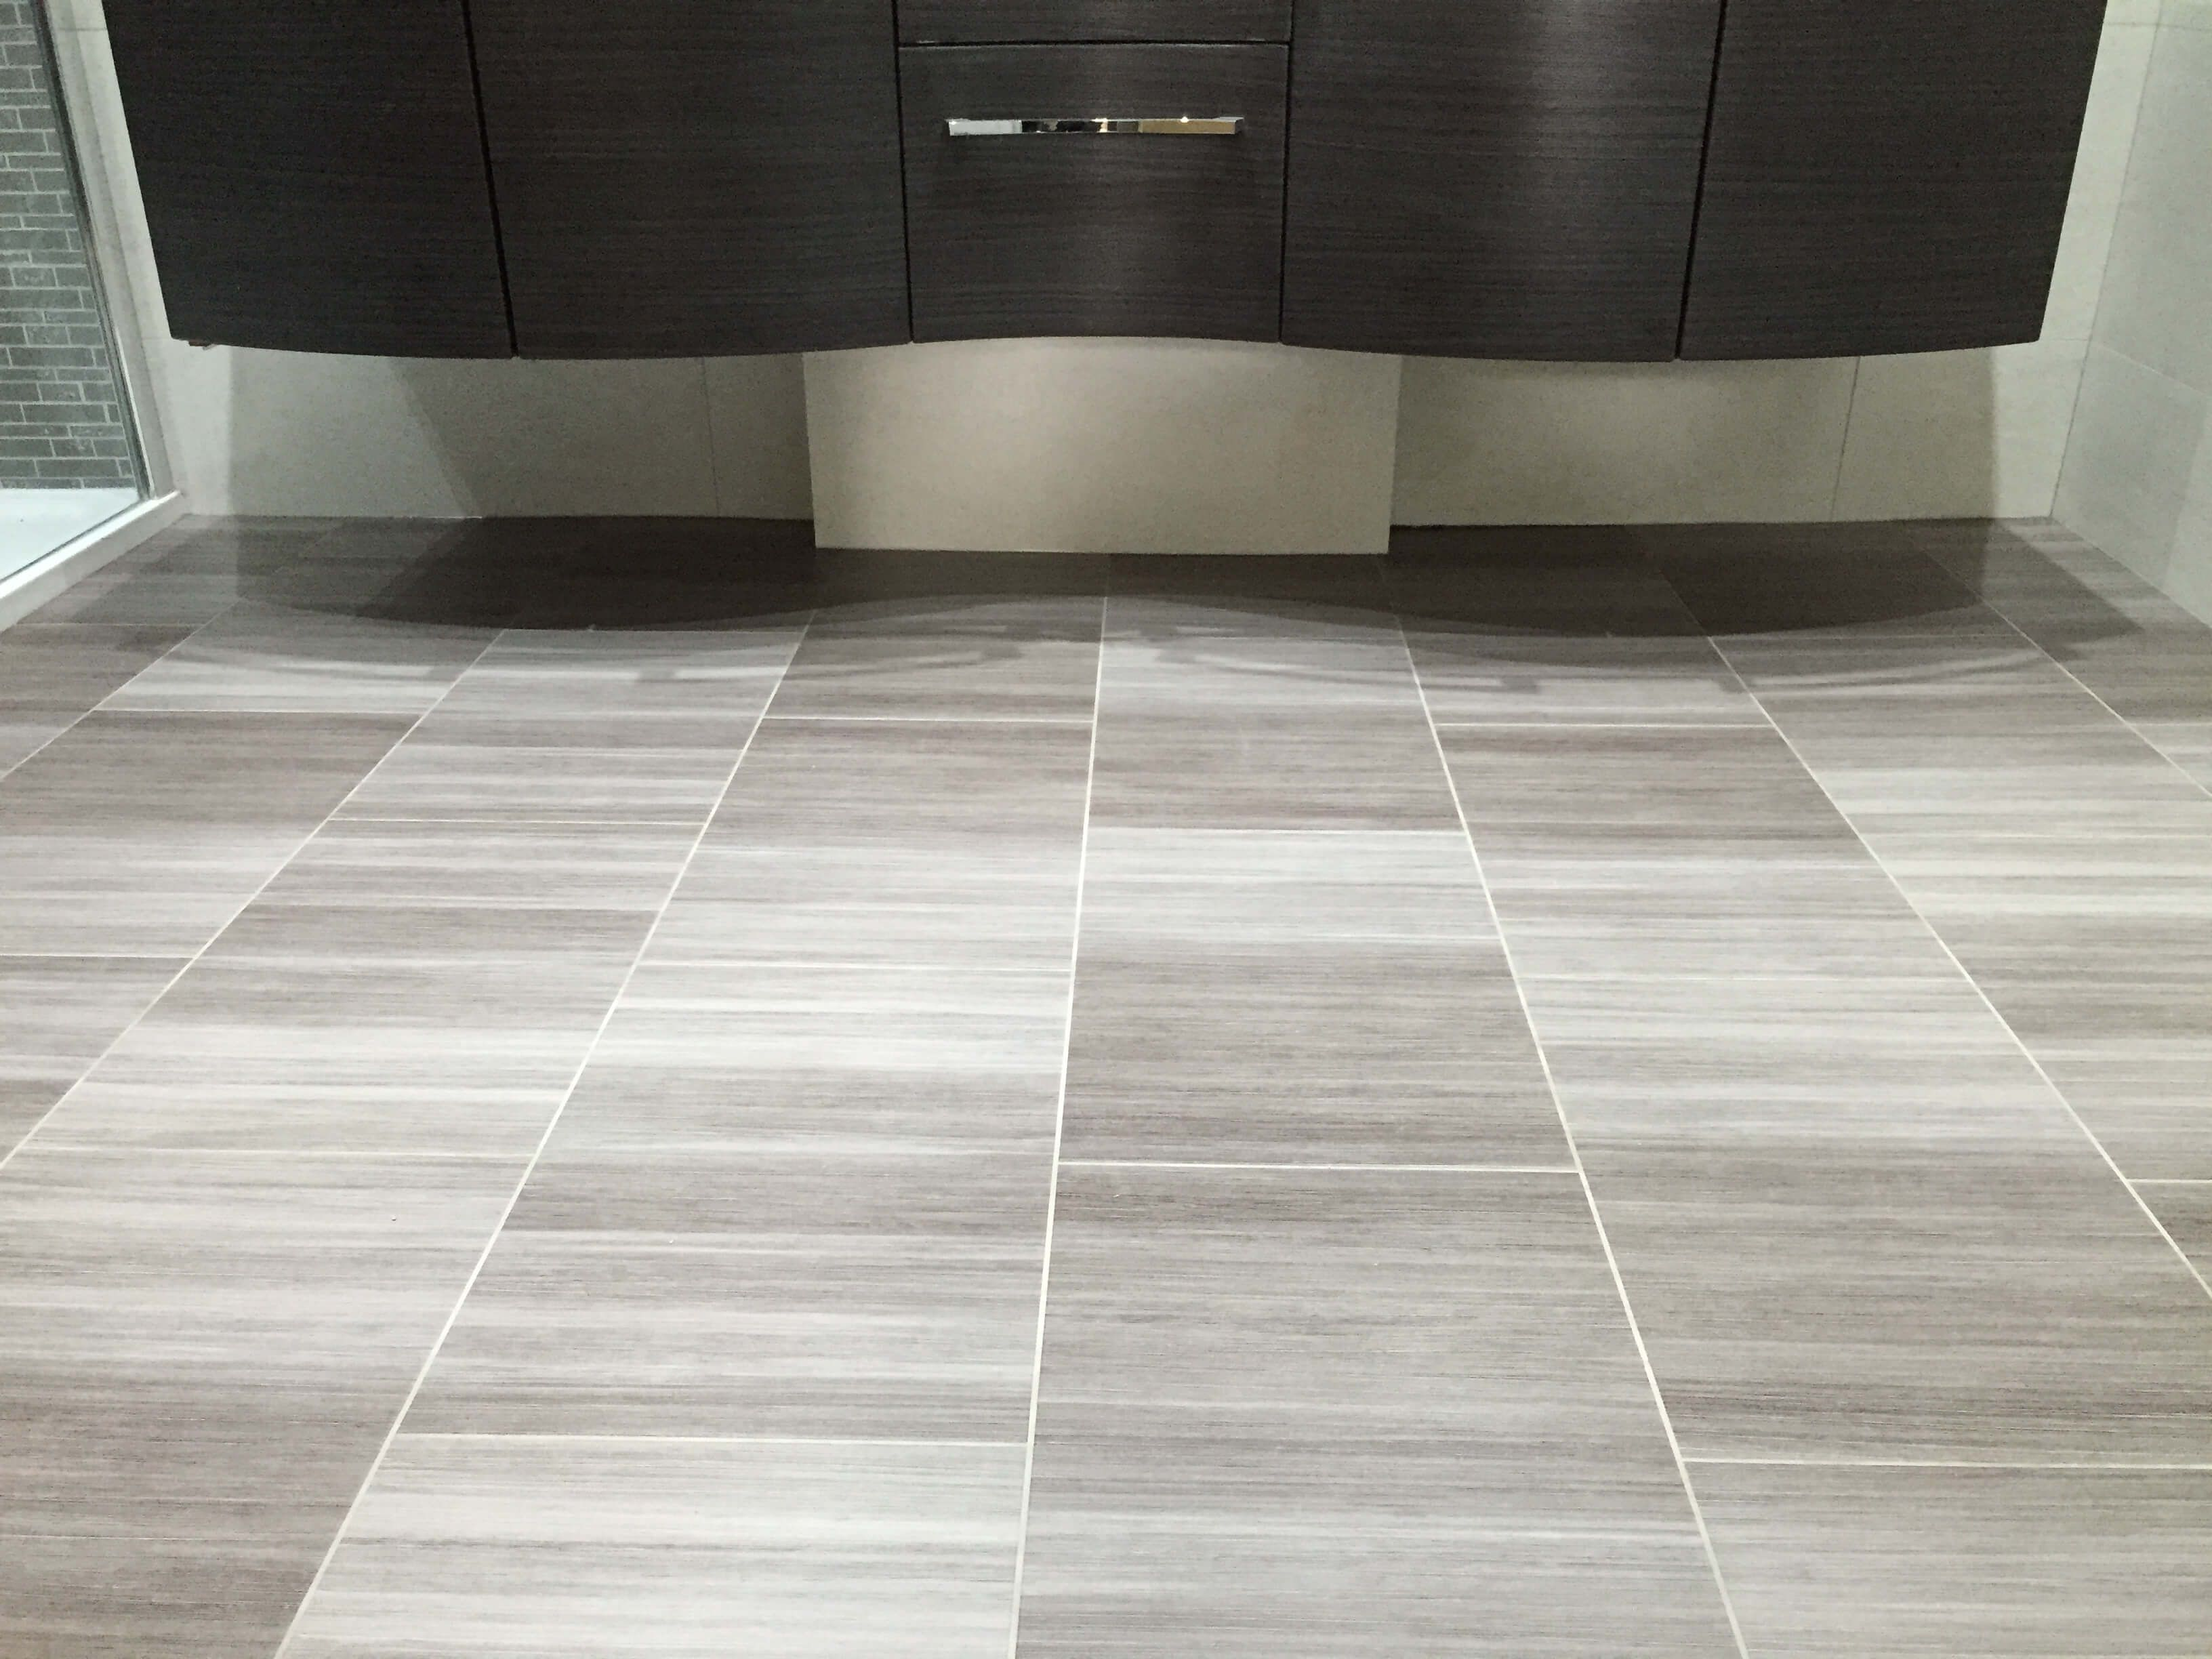 Amtico Bathroom Flooring Spacia Mirrus Hemp Vinyl kitchen